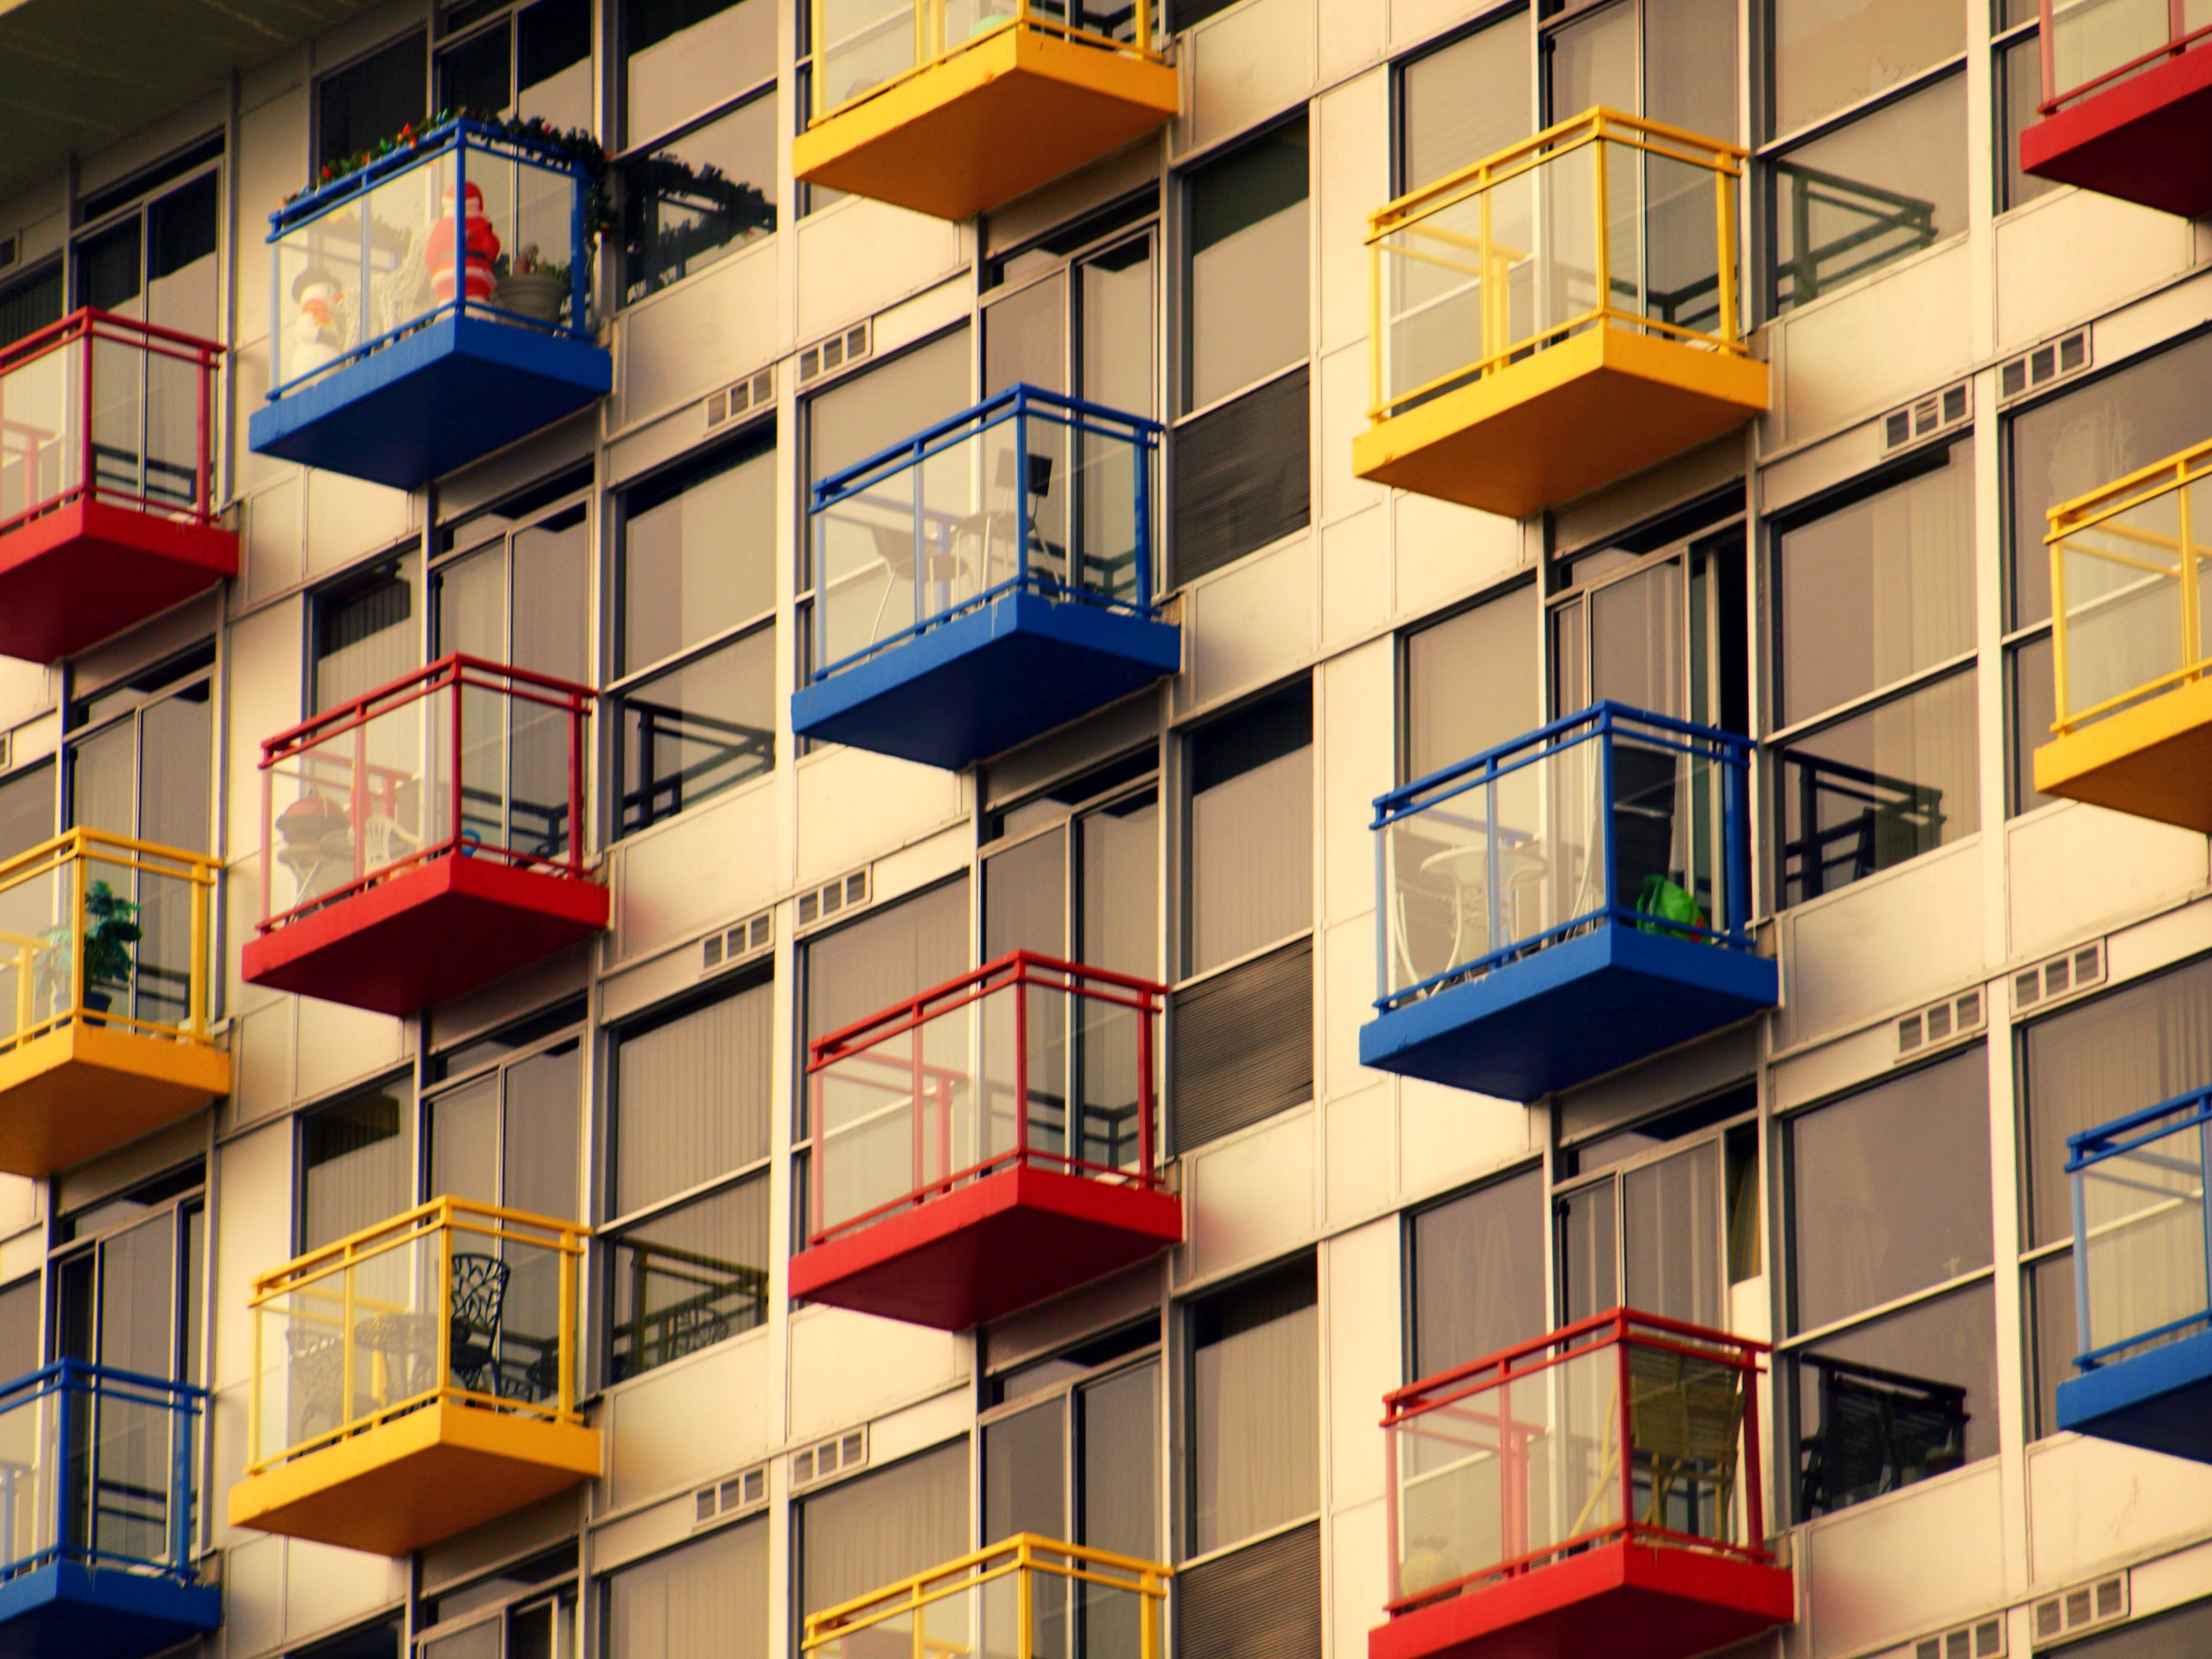 Kondominium dengan balkon yang berwarna-warni. Flickr - Michael Gil.